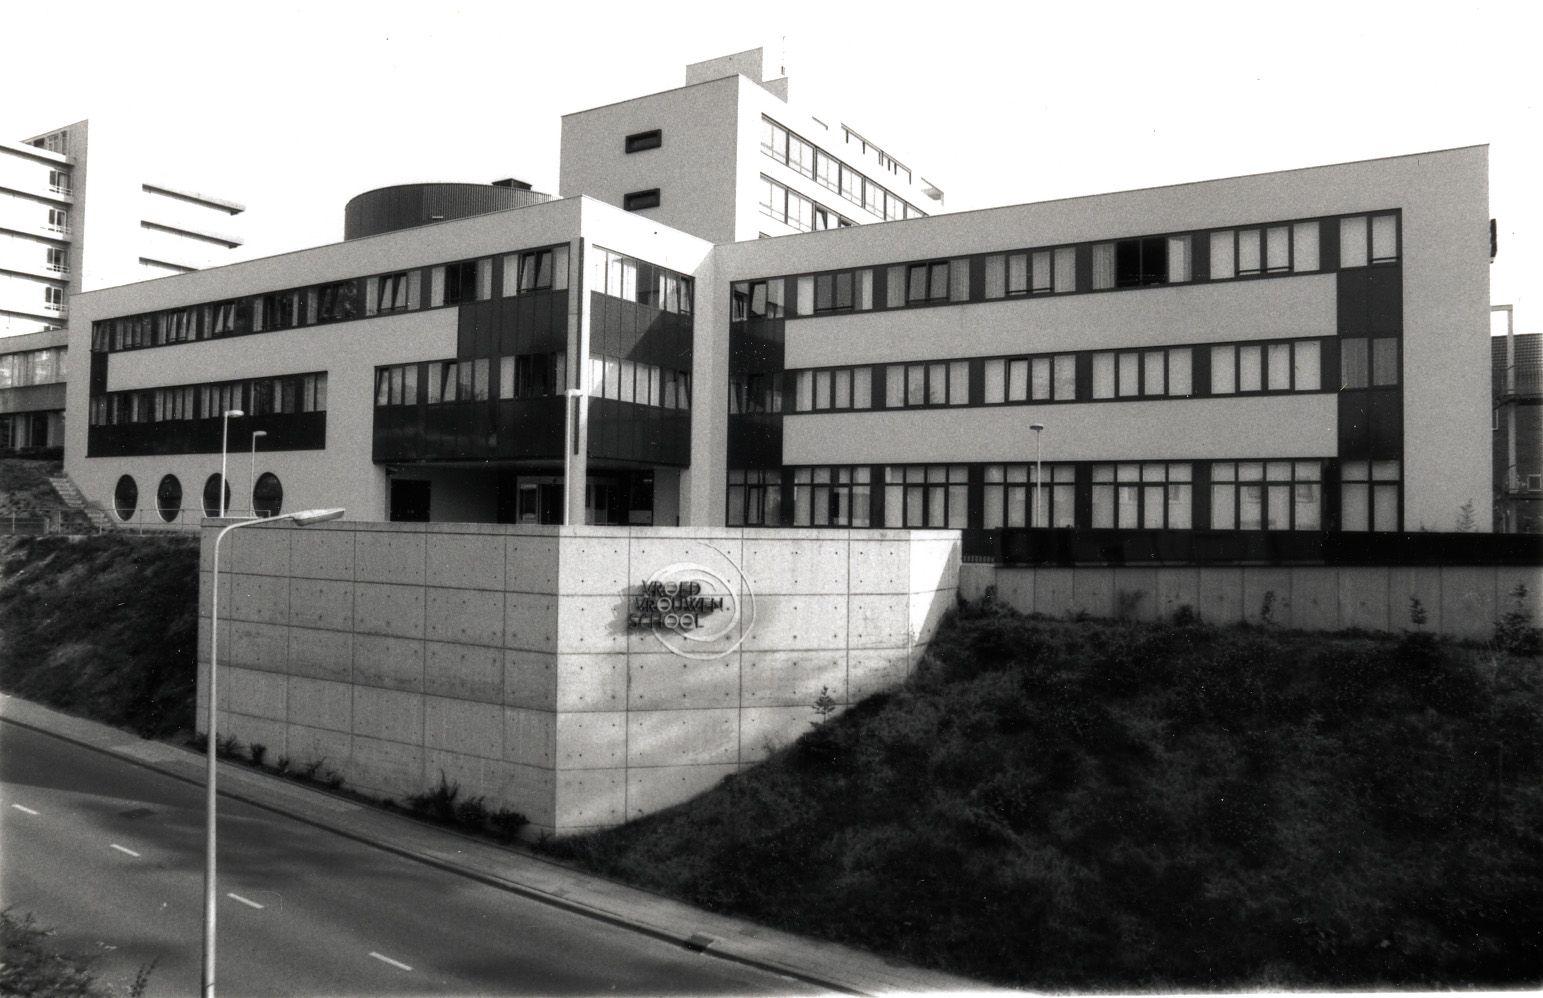 Verloskundig centrum 1993 -  Atrium Medisch Centrum Parkstad